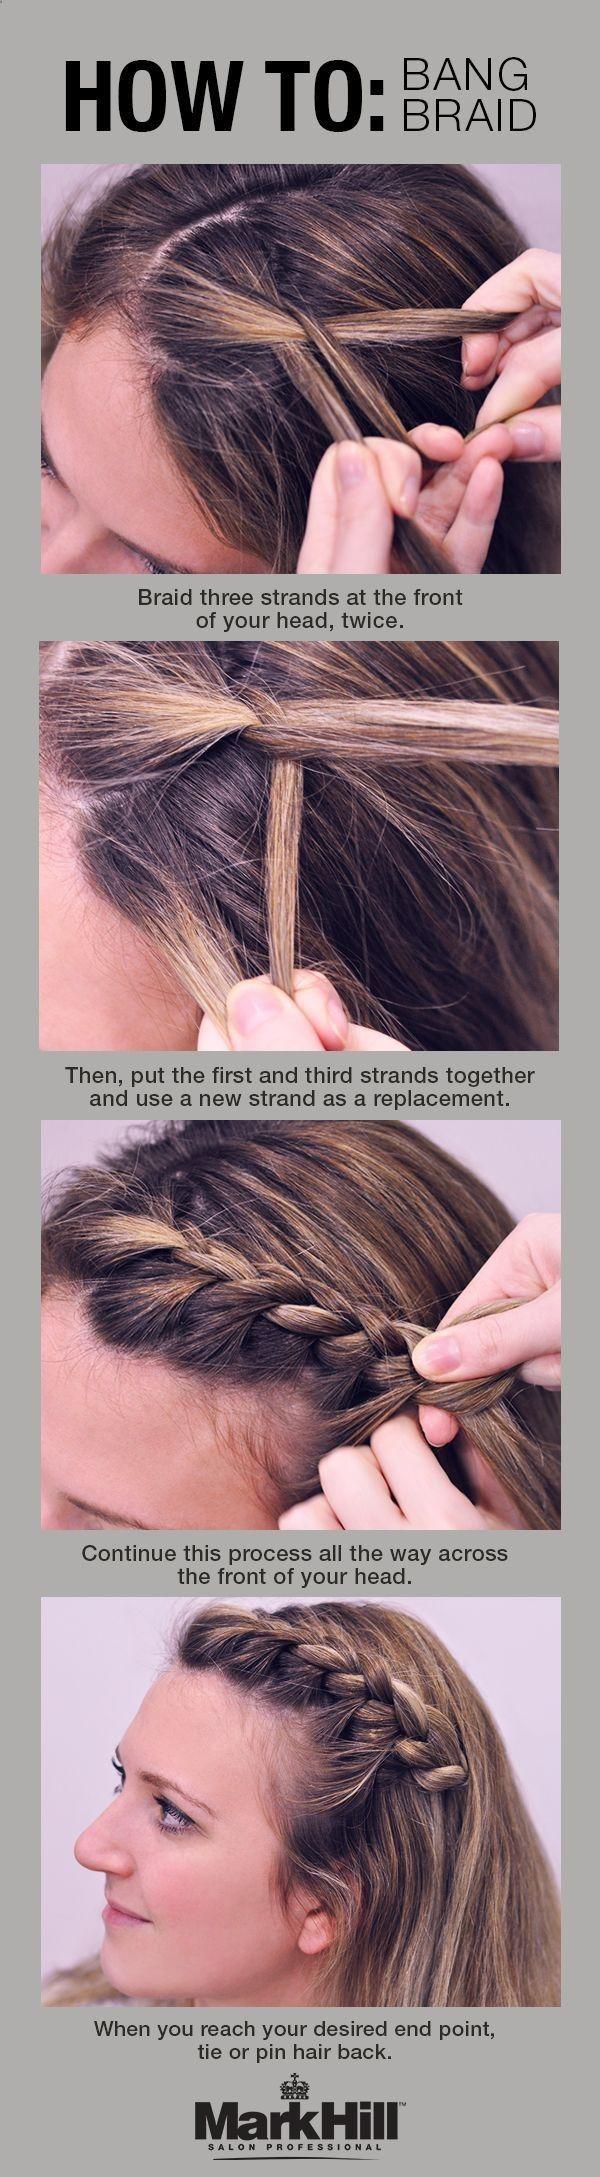 Finally, a tutorial I can follow! great gym and Summer hair tutorials #hair #beauty